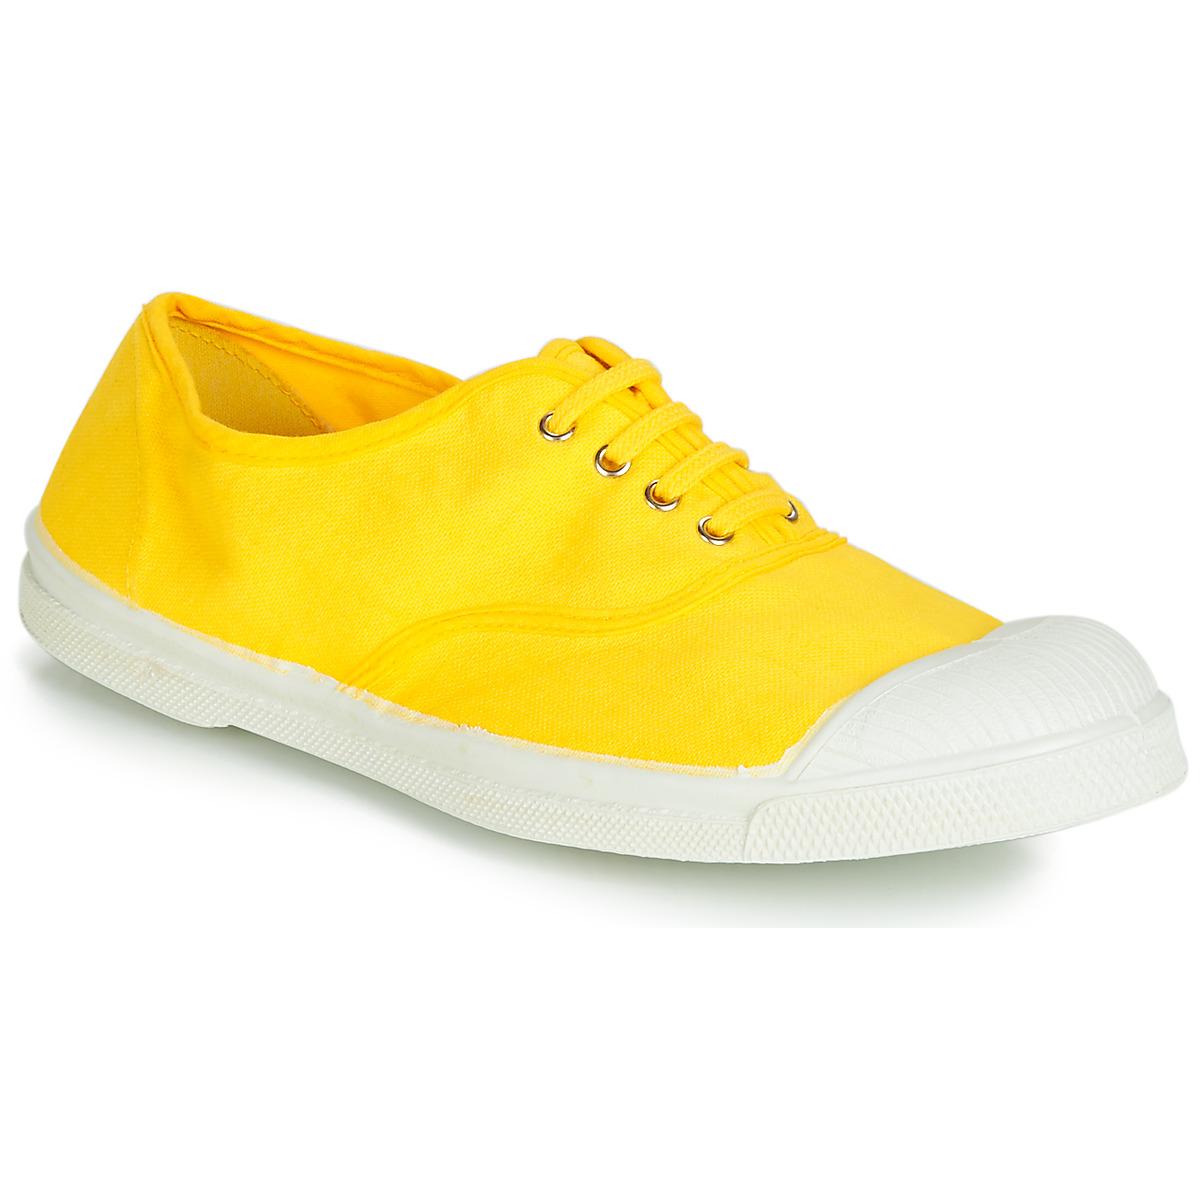 Bensimon damessneaker geel